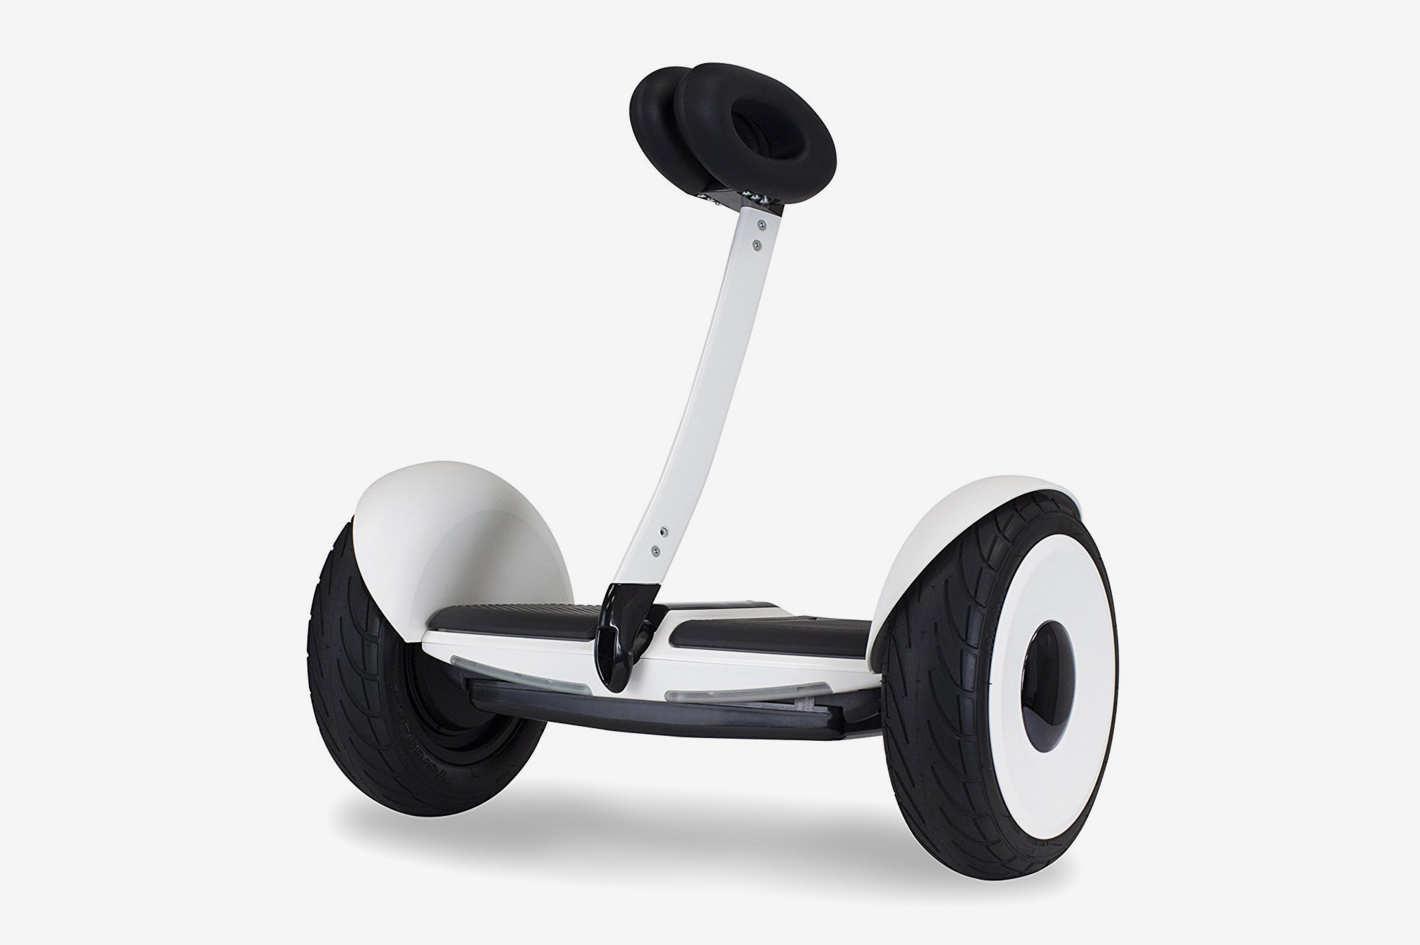 Segway miniLITE — Smart Self Balancing Personal Transporter